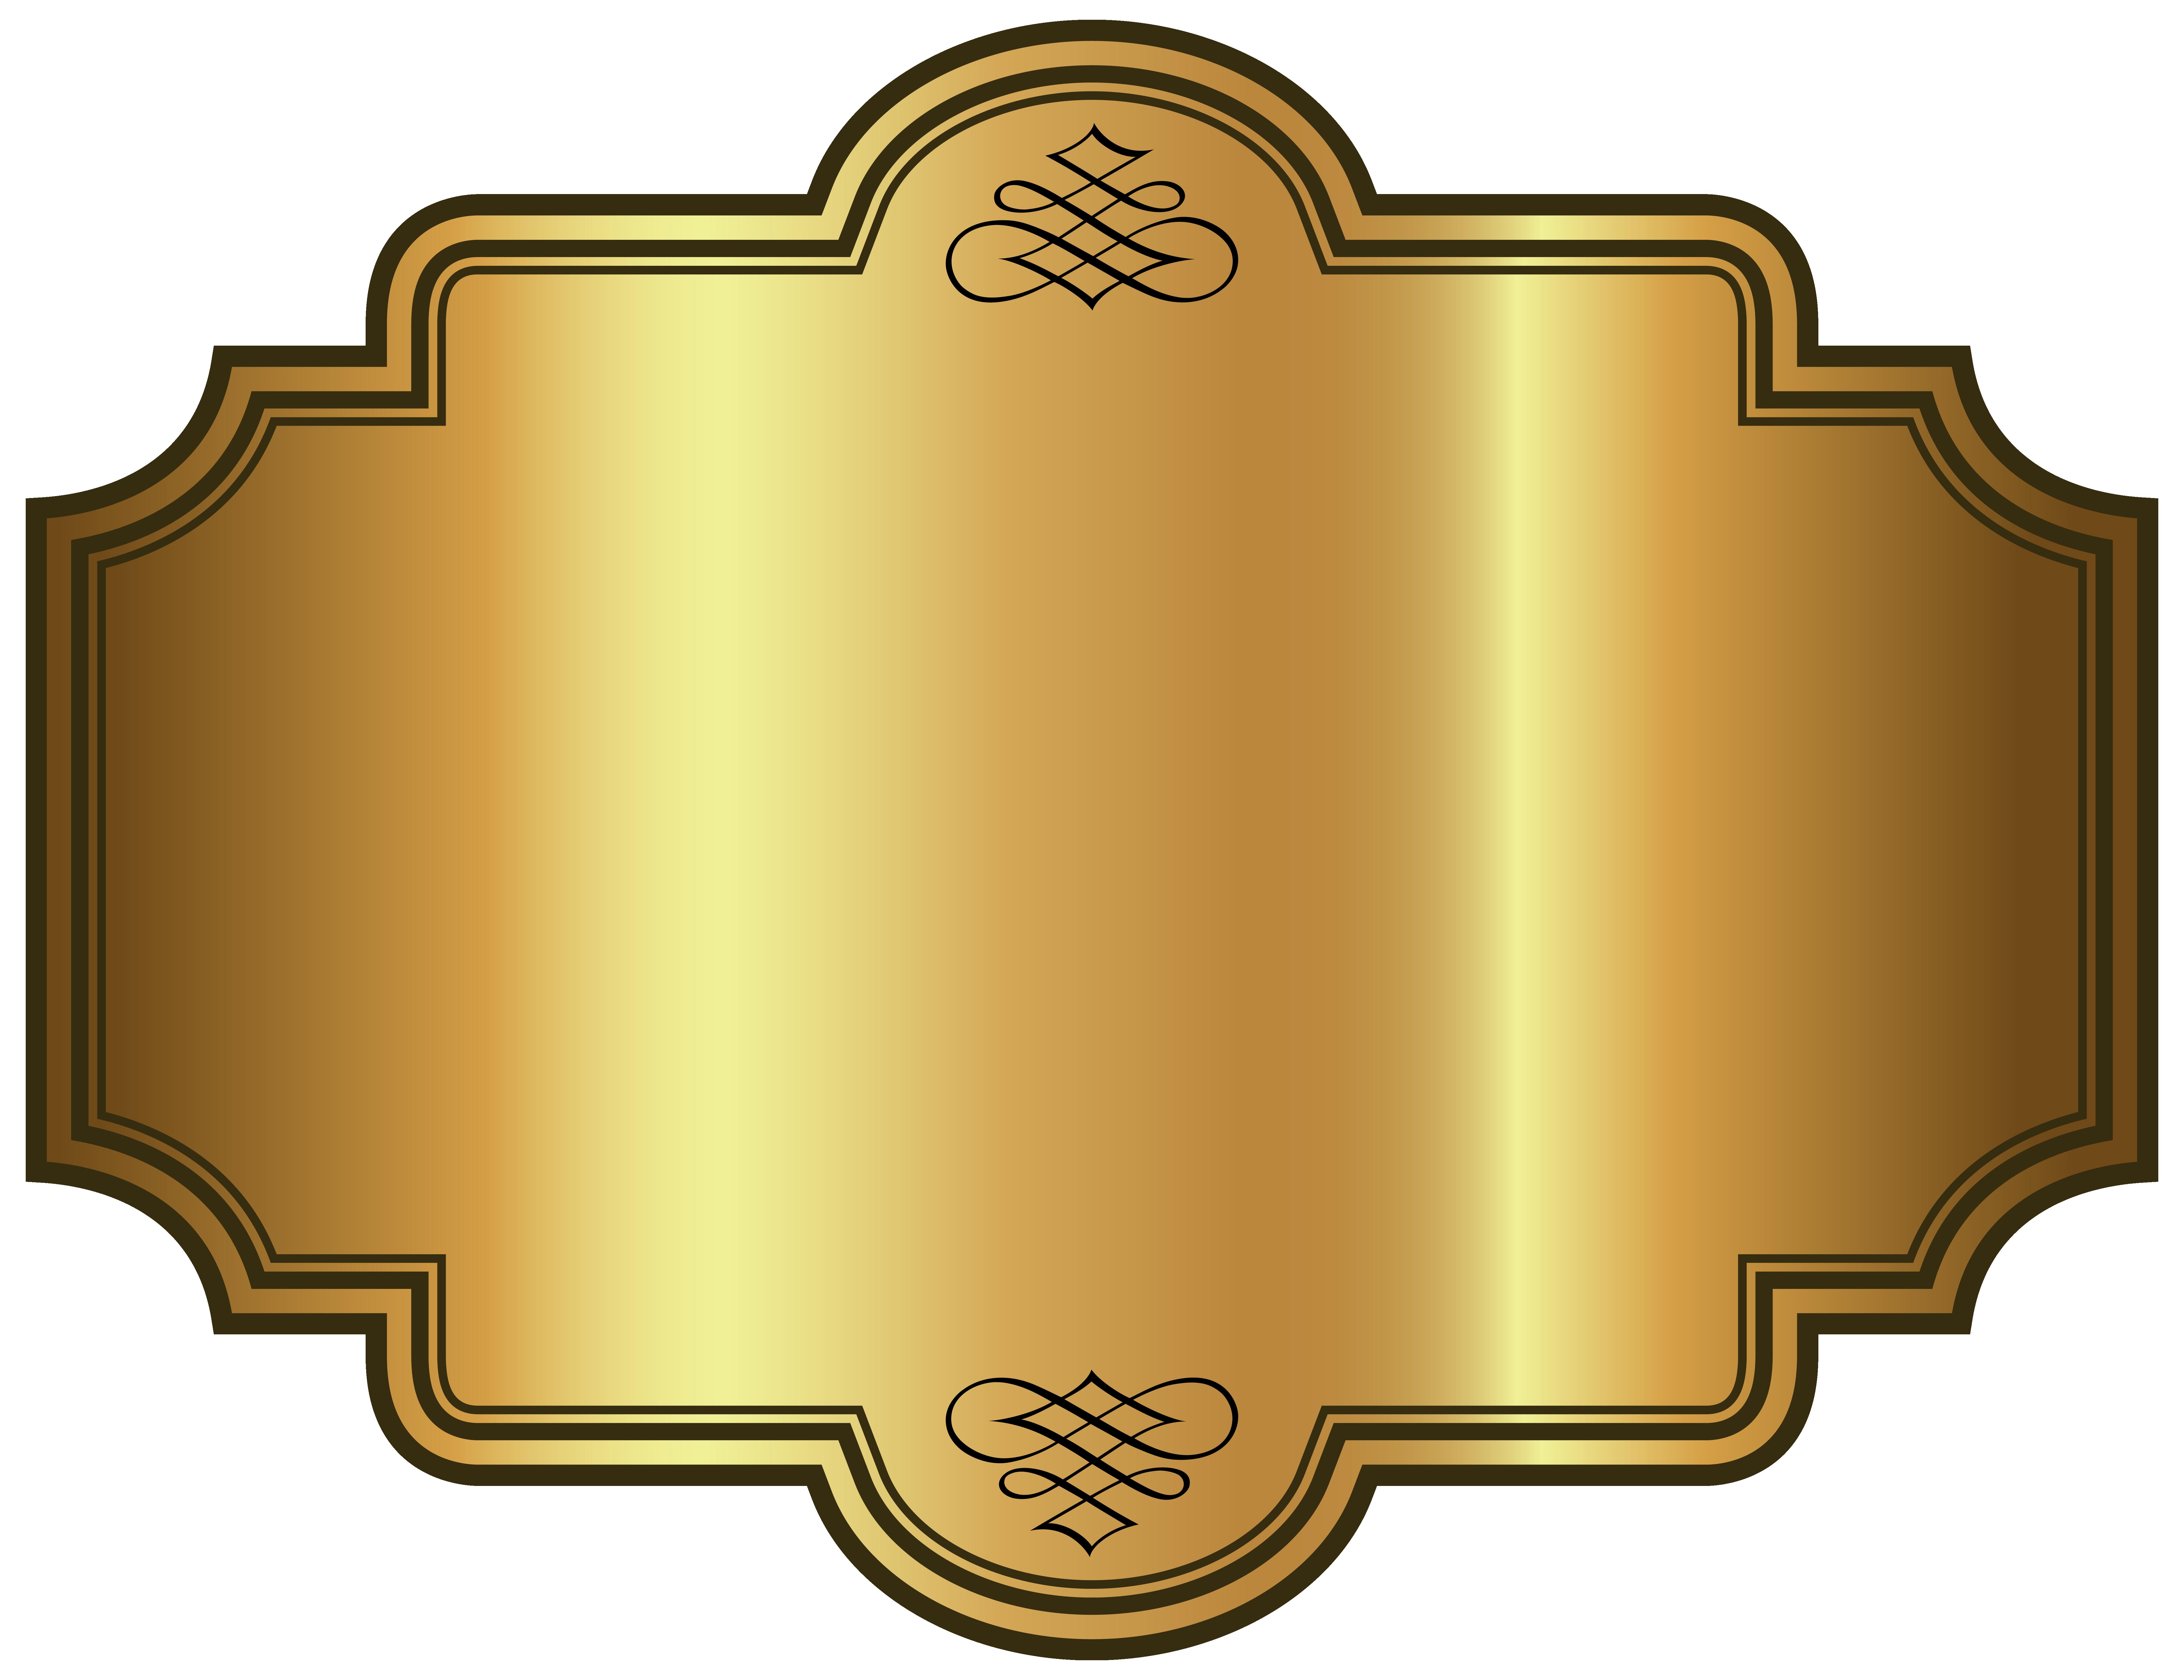 Golden Luxury Label Template Clipart Picture Gallery Yopriceville High Quality Images And Transparent Png Fre Karya Seni 3d Desain Produk Kartu Pernikahan